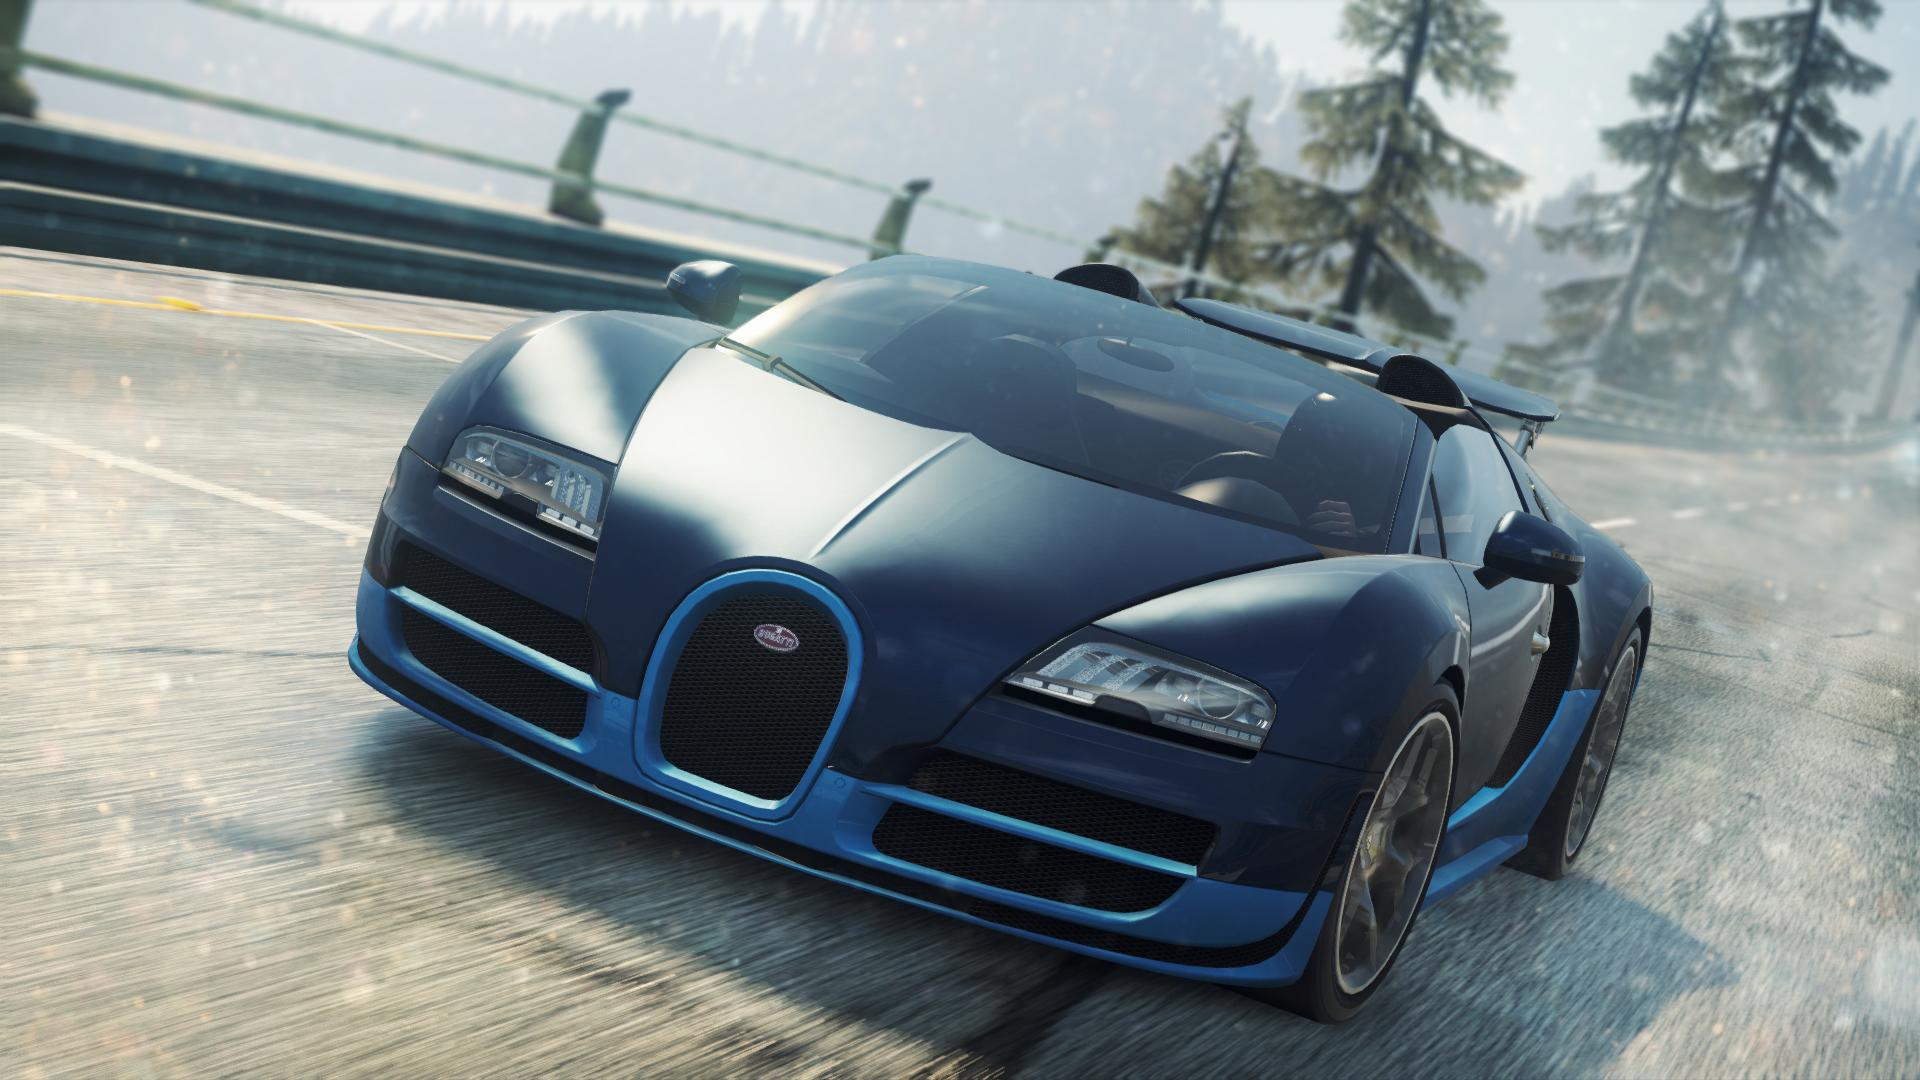 bugatti veyron grand sport vitesse need for speed wiki. Black Bedroom Furniture Sets. Home Design Ideas